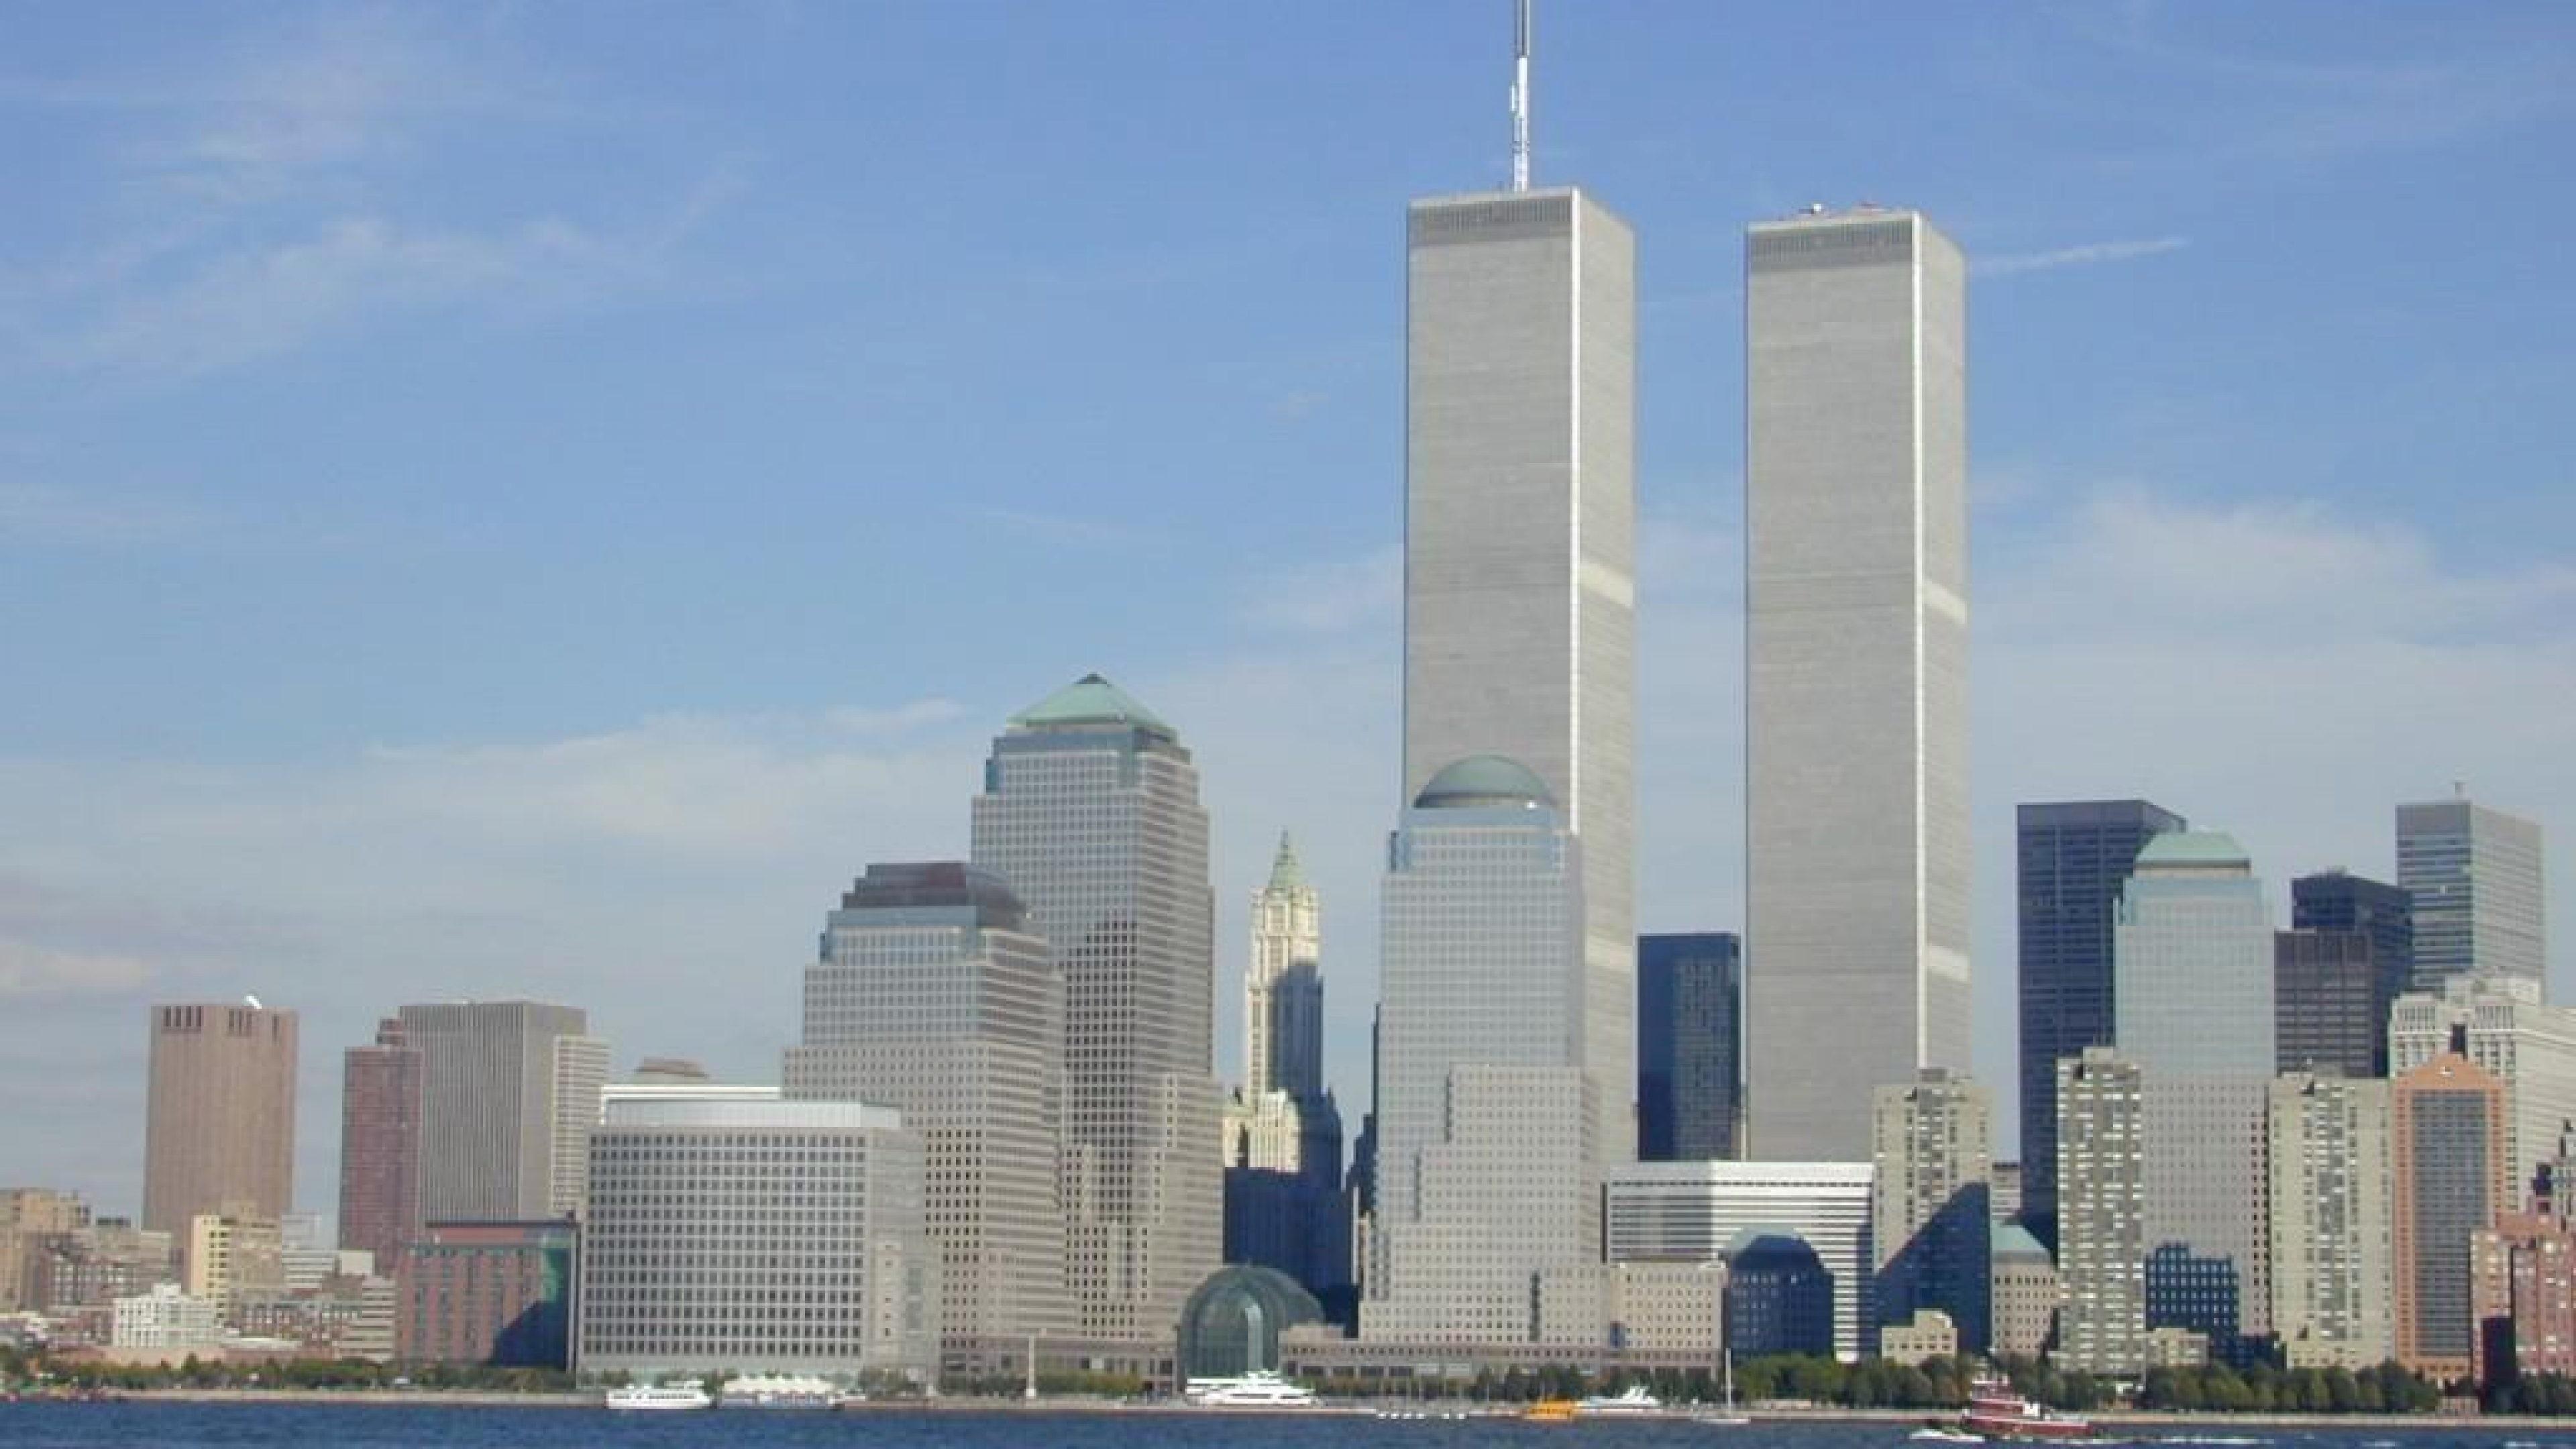 World Trade Center Wallpaper Hd